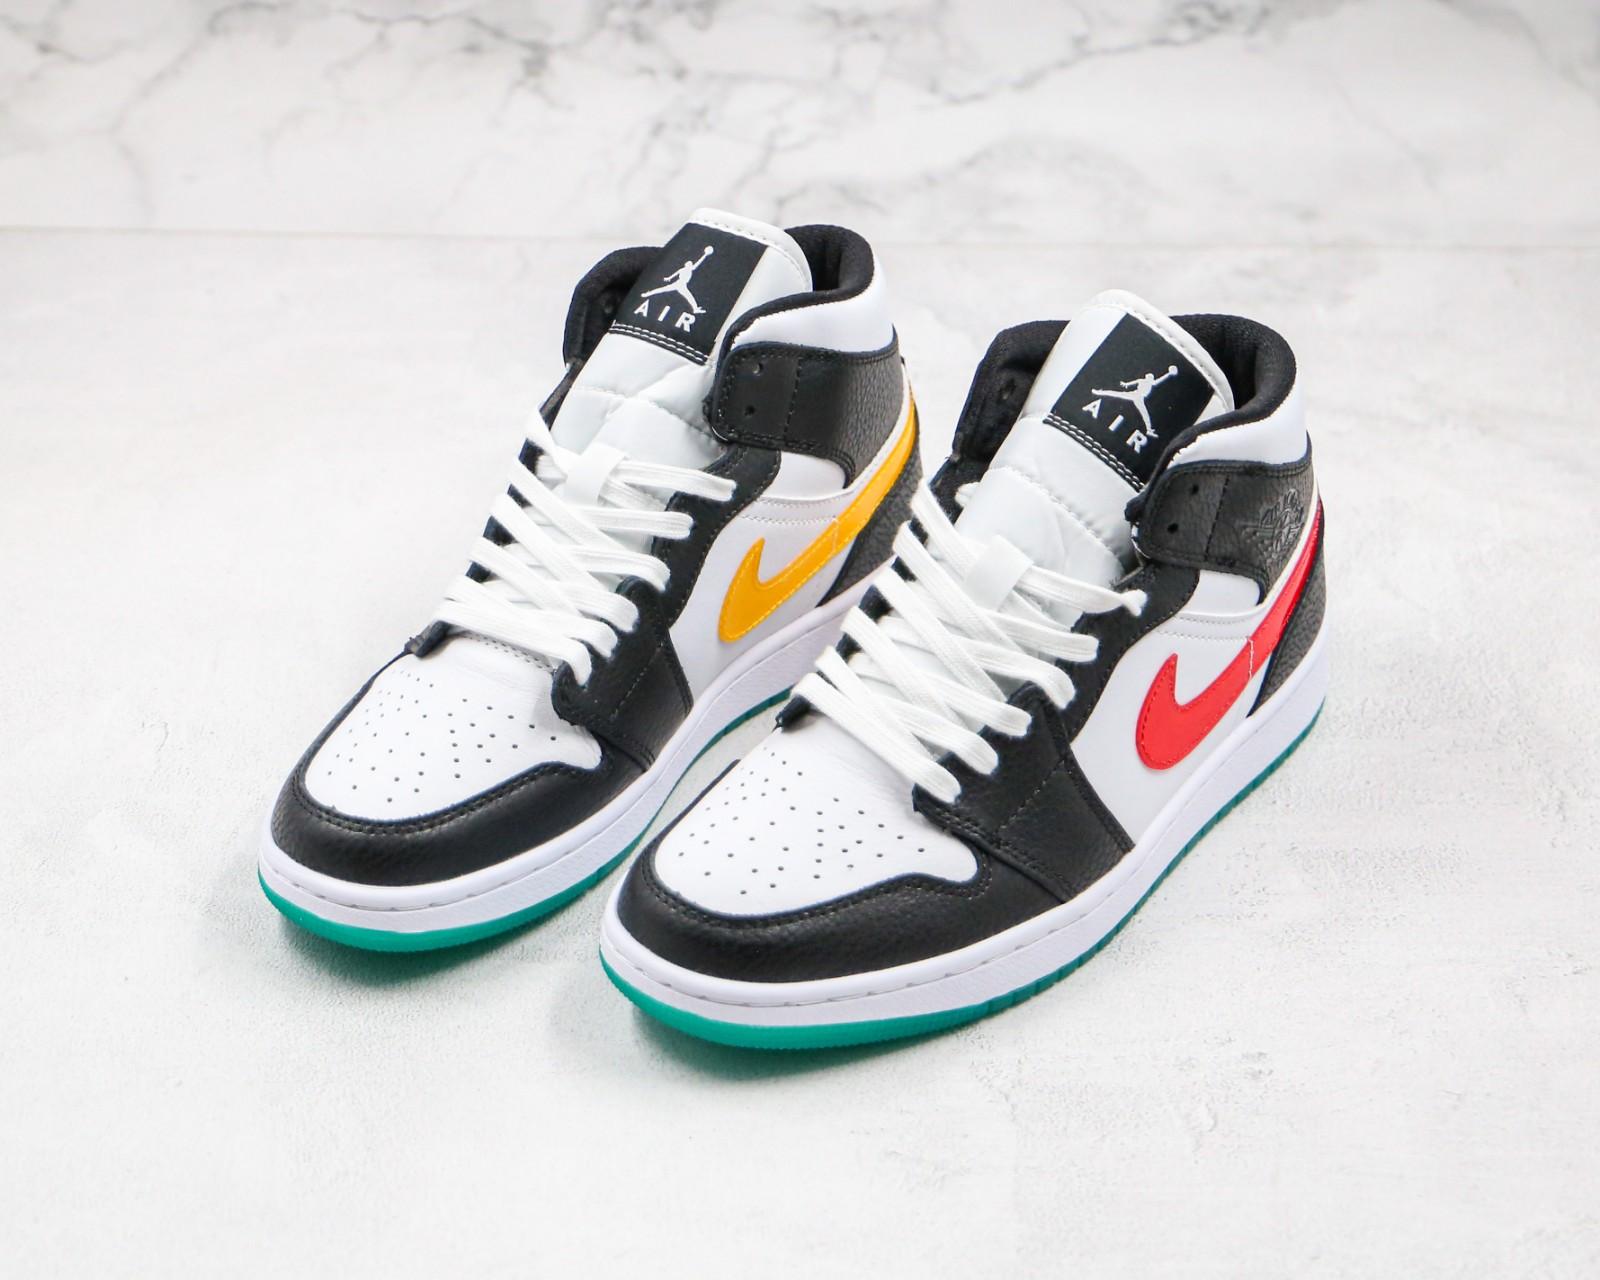 Nike Air Jordan 1 Mid Black White Red Yellow Alternate Swooshes BQ6472-063 for Sale - ReactRun